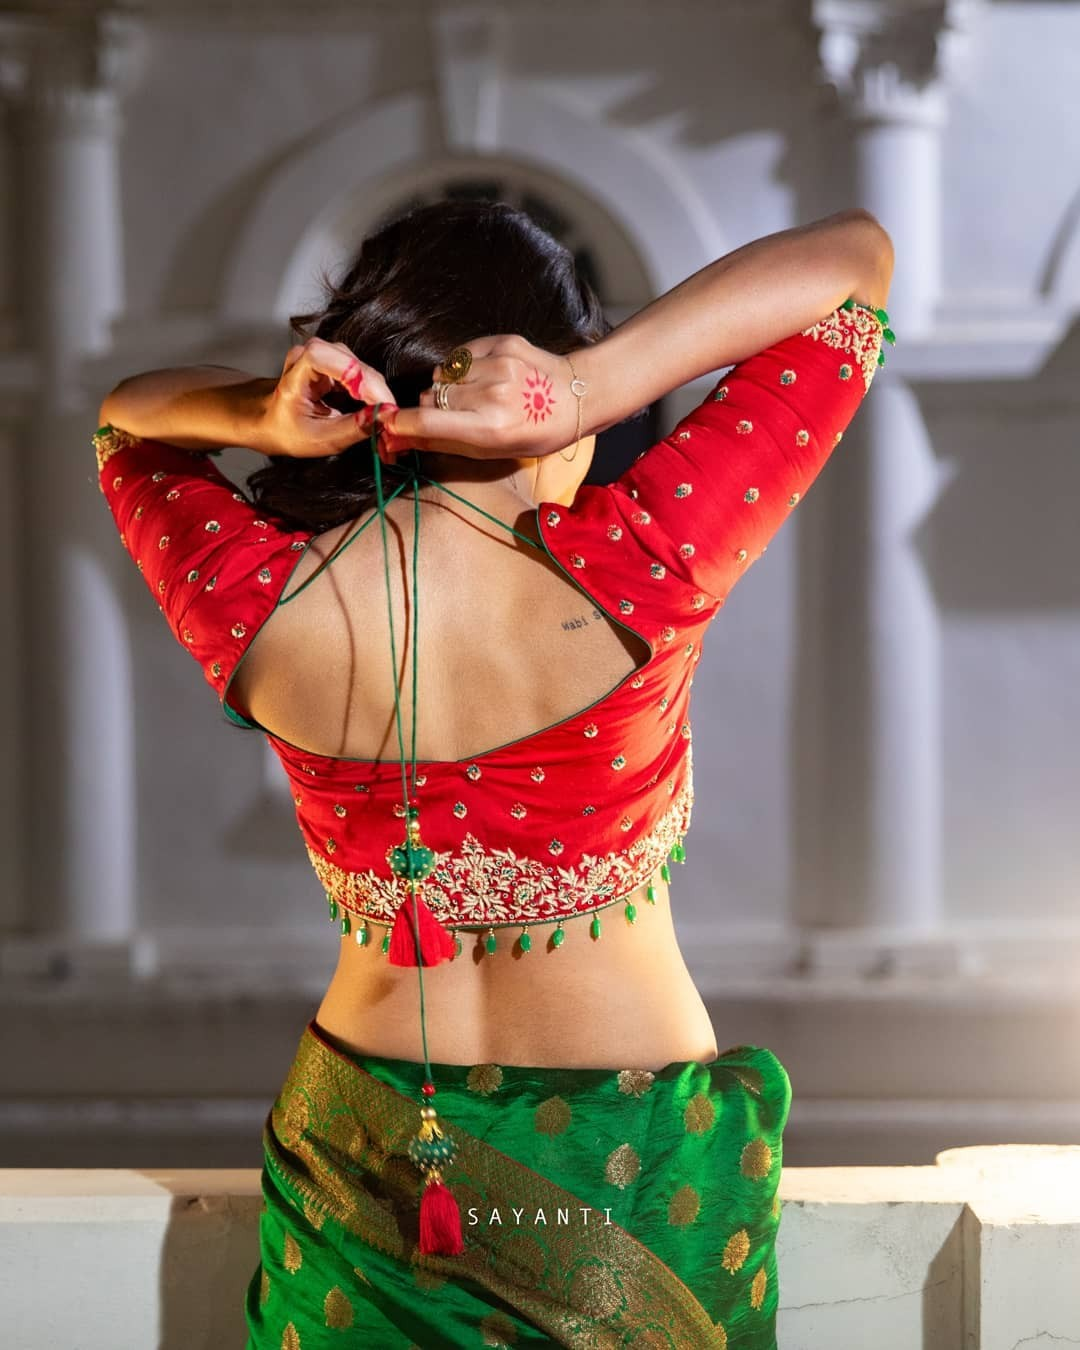 rED BLOUSE WITH SILVER ZARI-Sayanti Ghosh